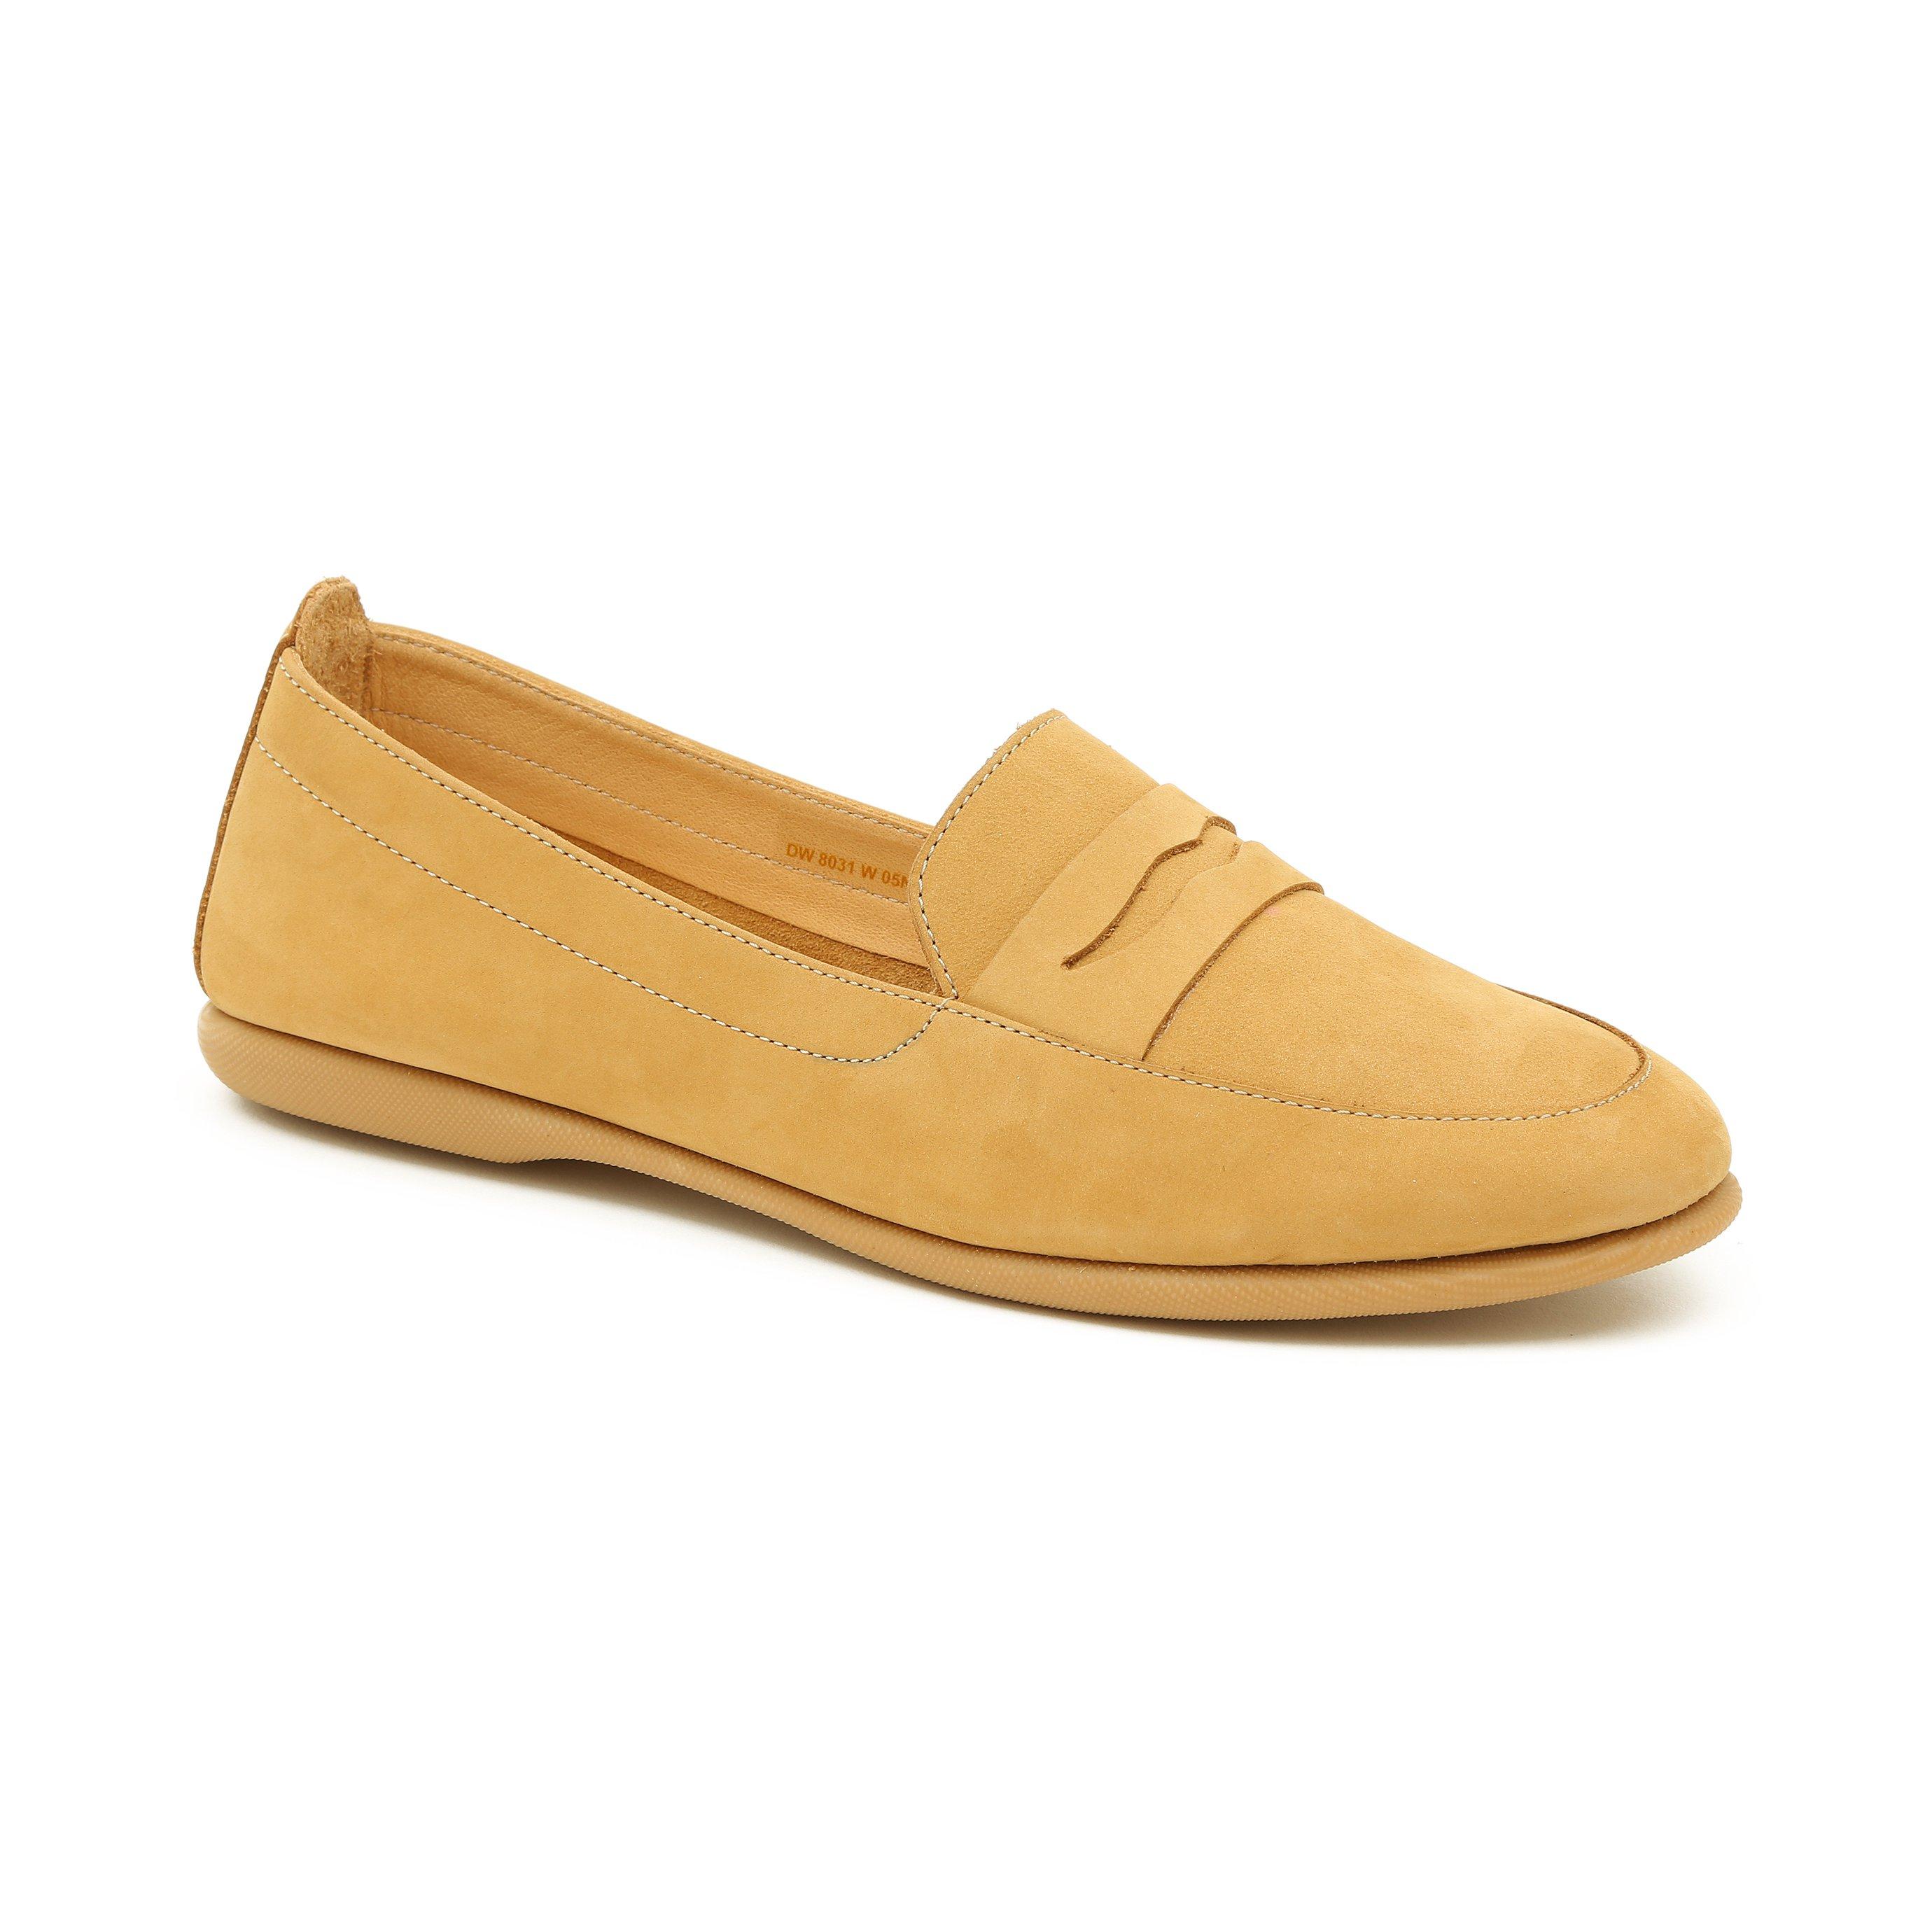 Darkwood - נעלי מוקסין קלאסיות 8031 מעור בצבע קינמון